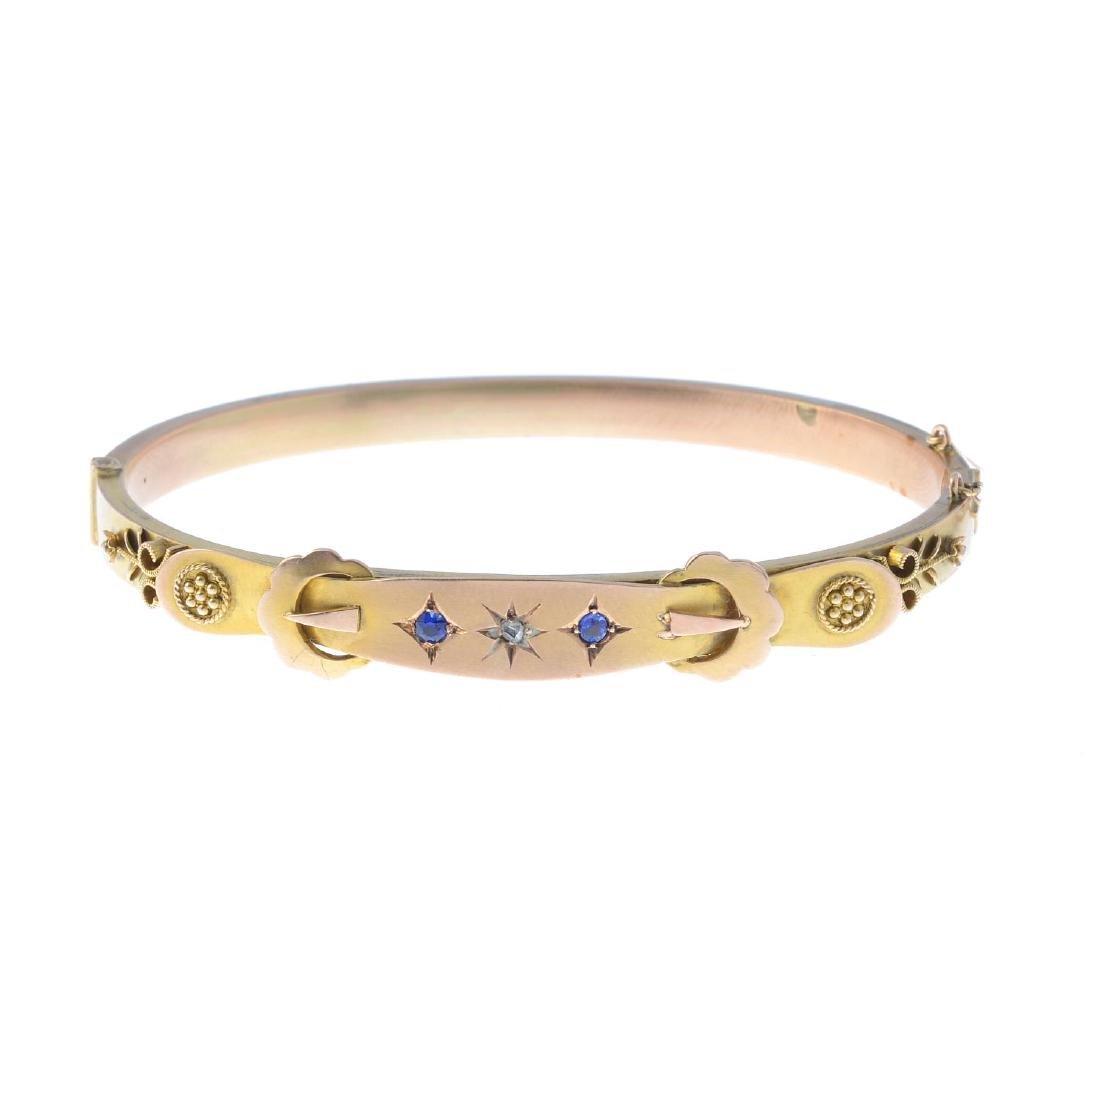 A late Victorian 9ct gold diamond and gem-set bangle.